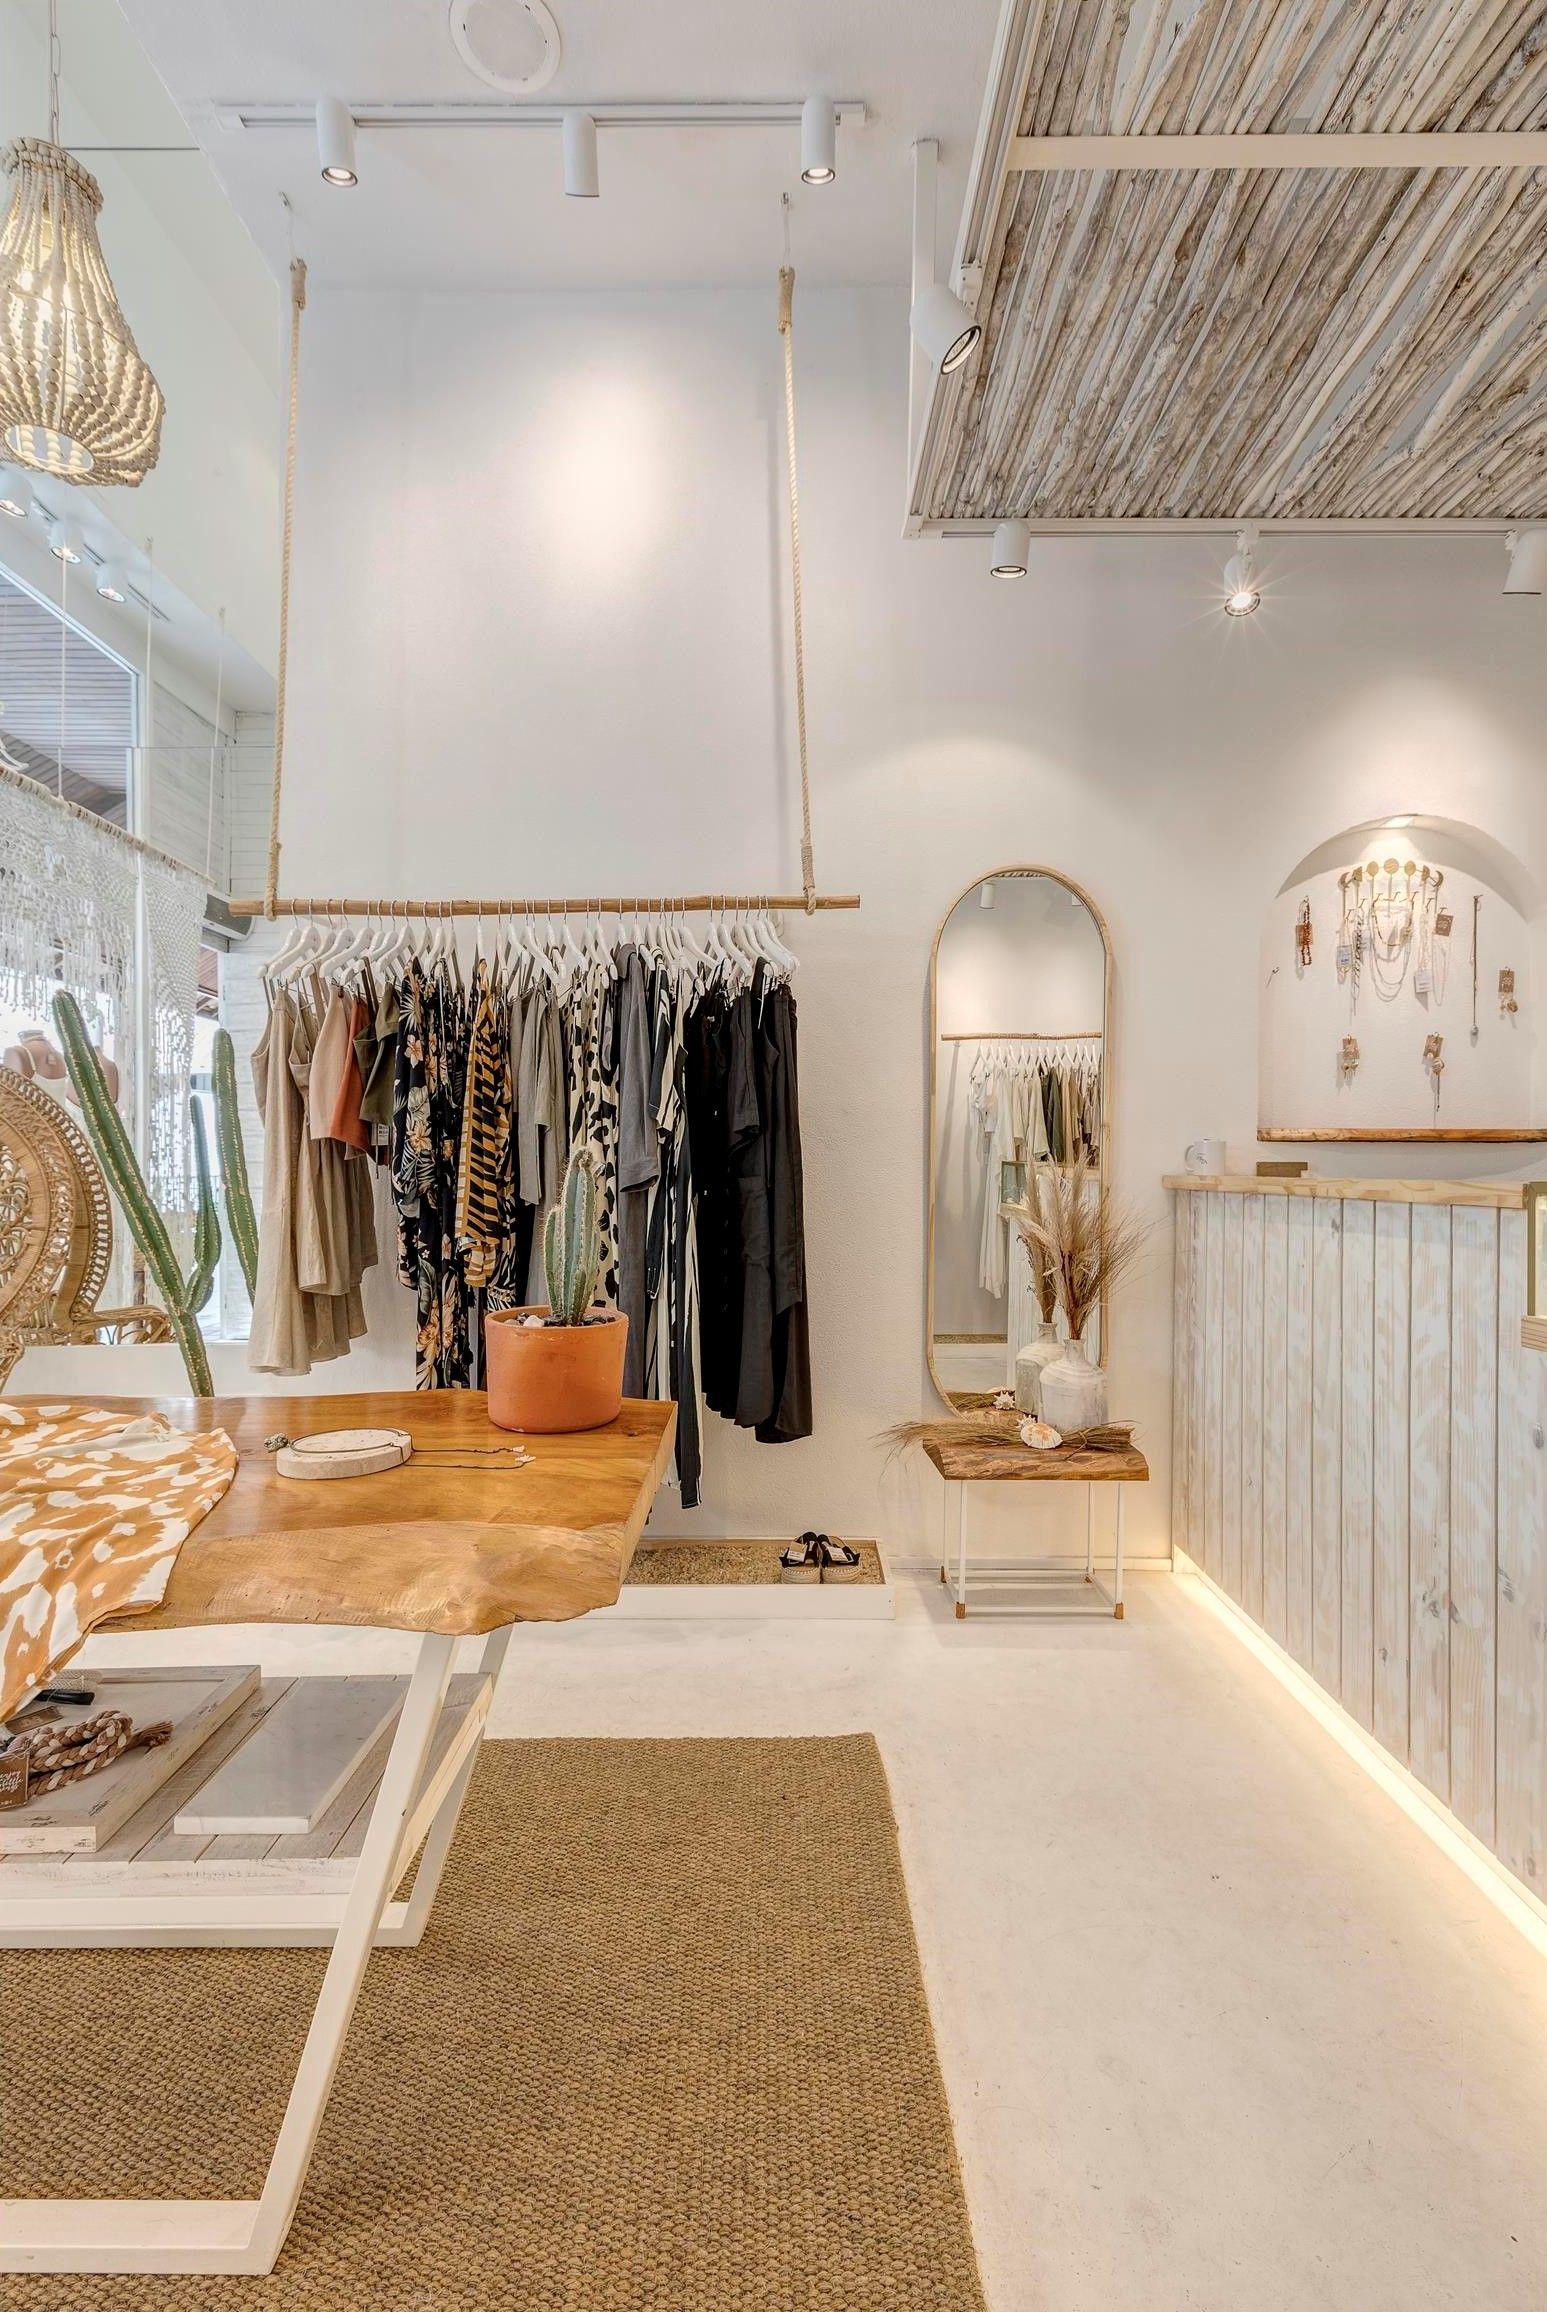 Retail Store Architecture Scandinavian And Rustic Mediterranean Boho And Natural Dec Store Design Interior Store Design Boutique Retail Store Interior Design